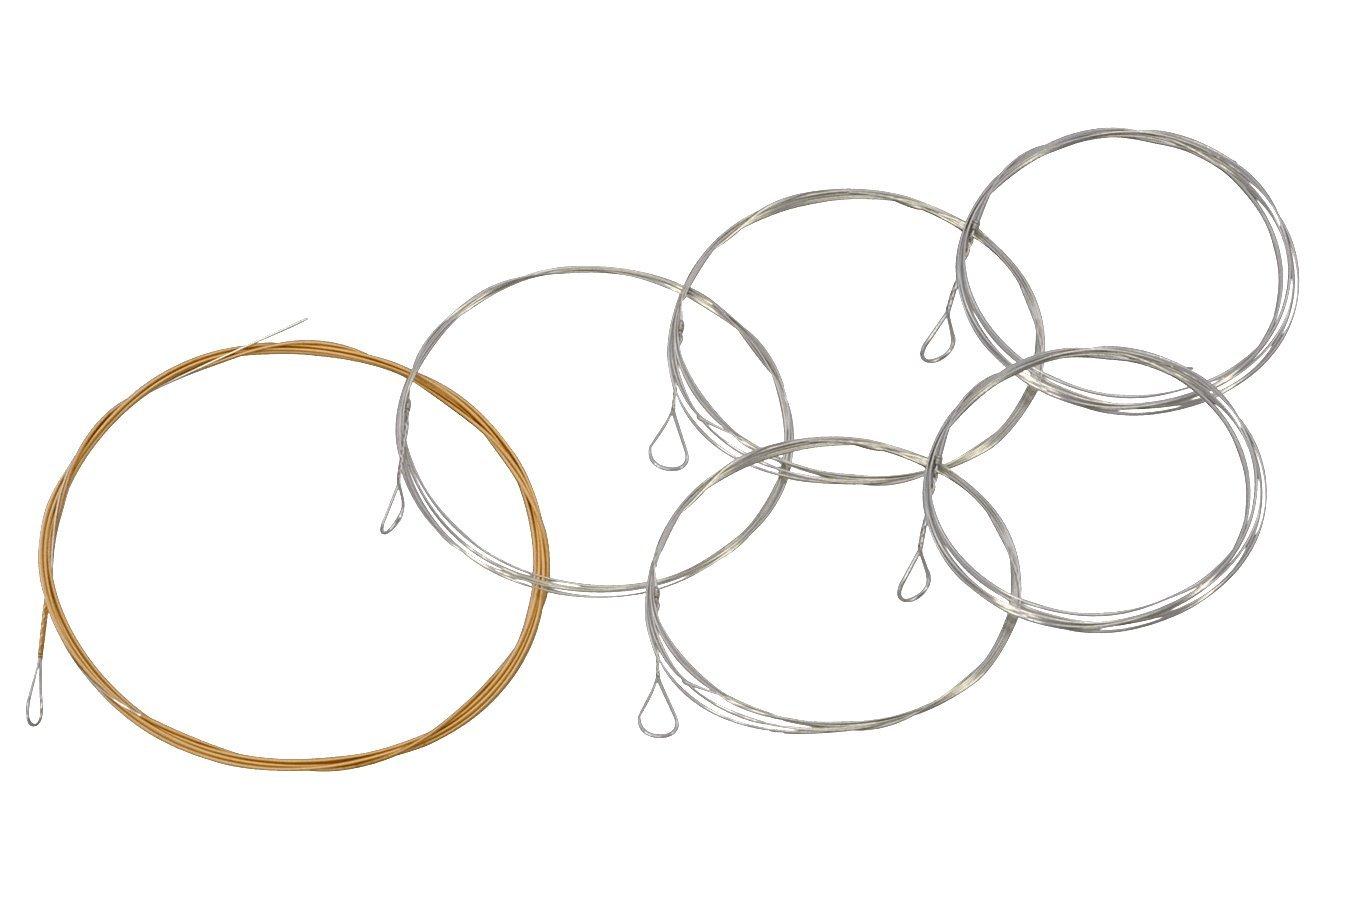 Folkcraft Brand Mountain Dulcimer String Set, Six String, Loop Ends (.011.011.013.013.024BW.011)